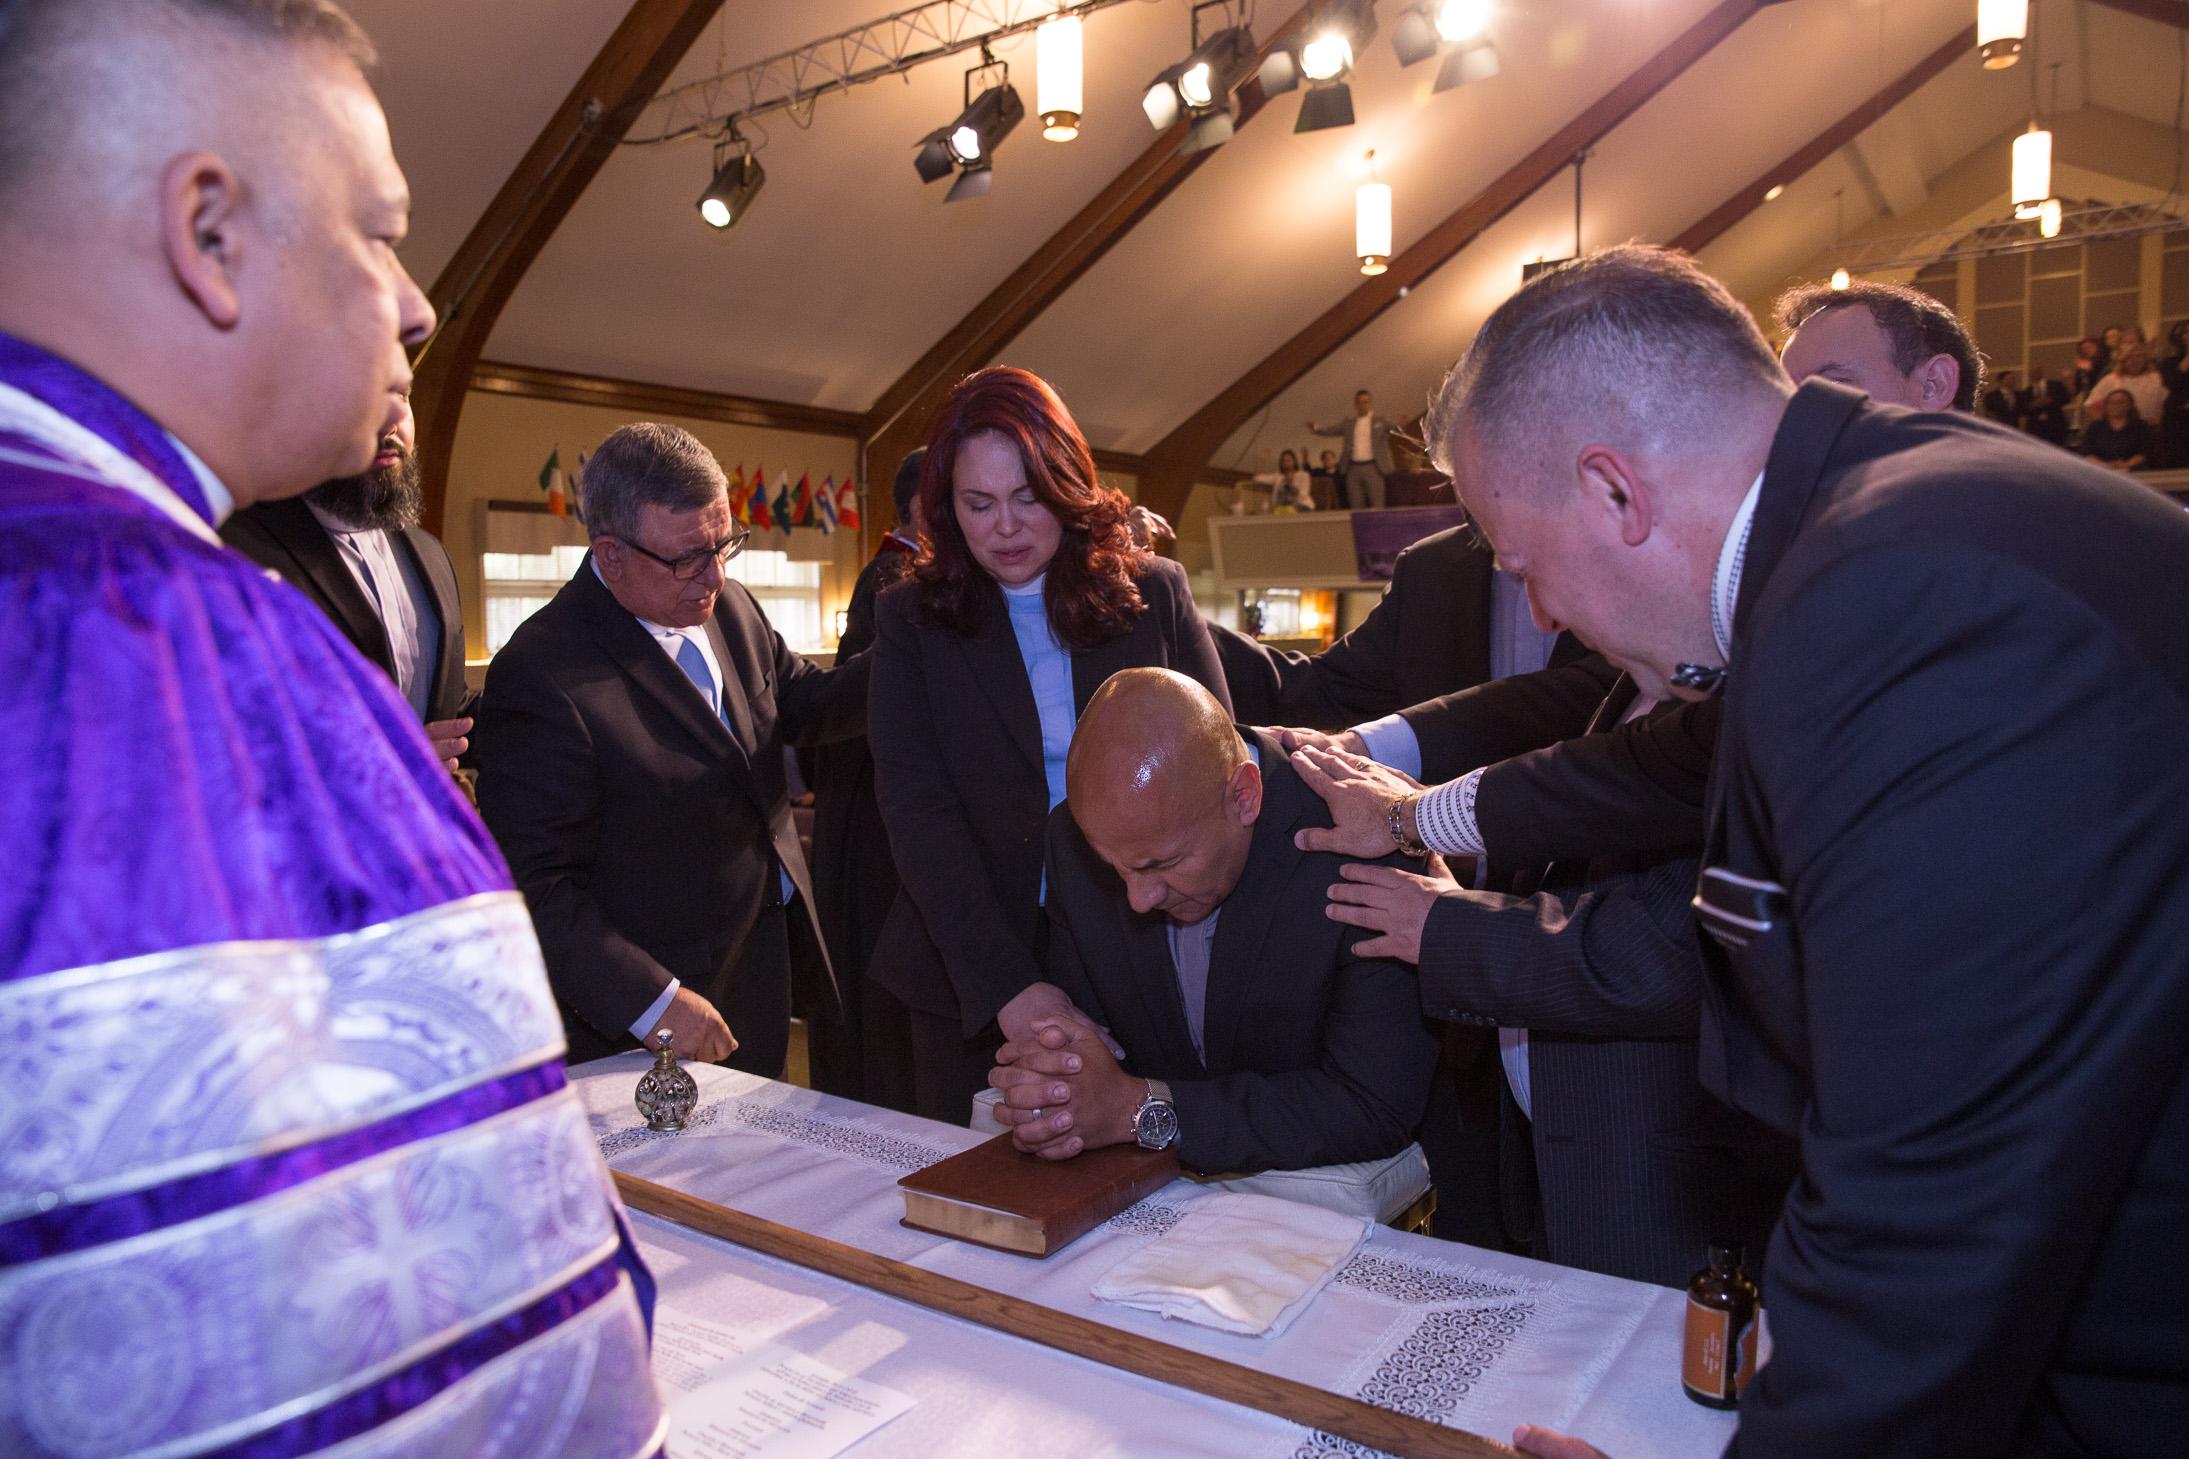 Ceremony fot the Installation of Rev. Luciano Padilla